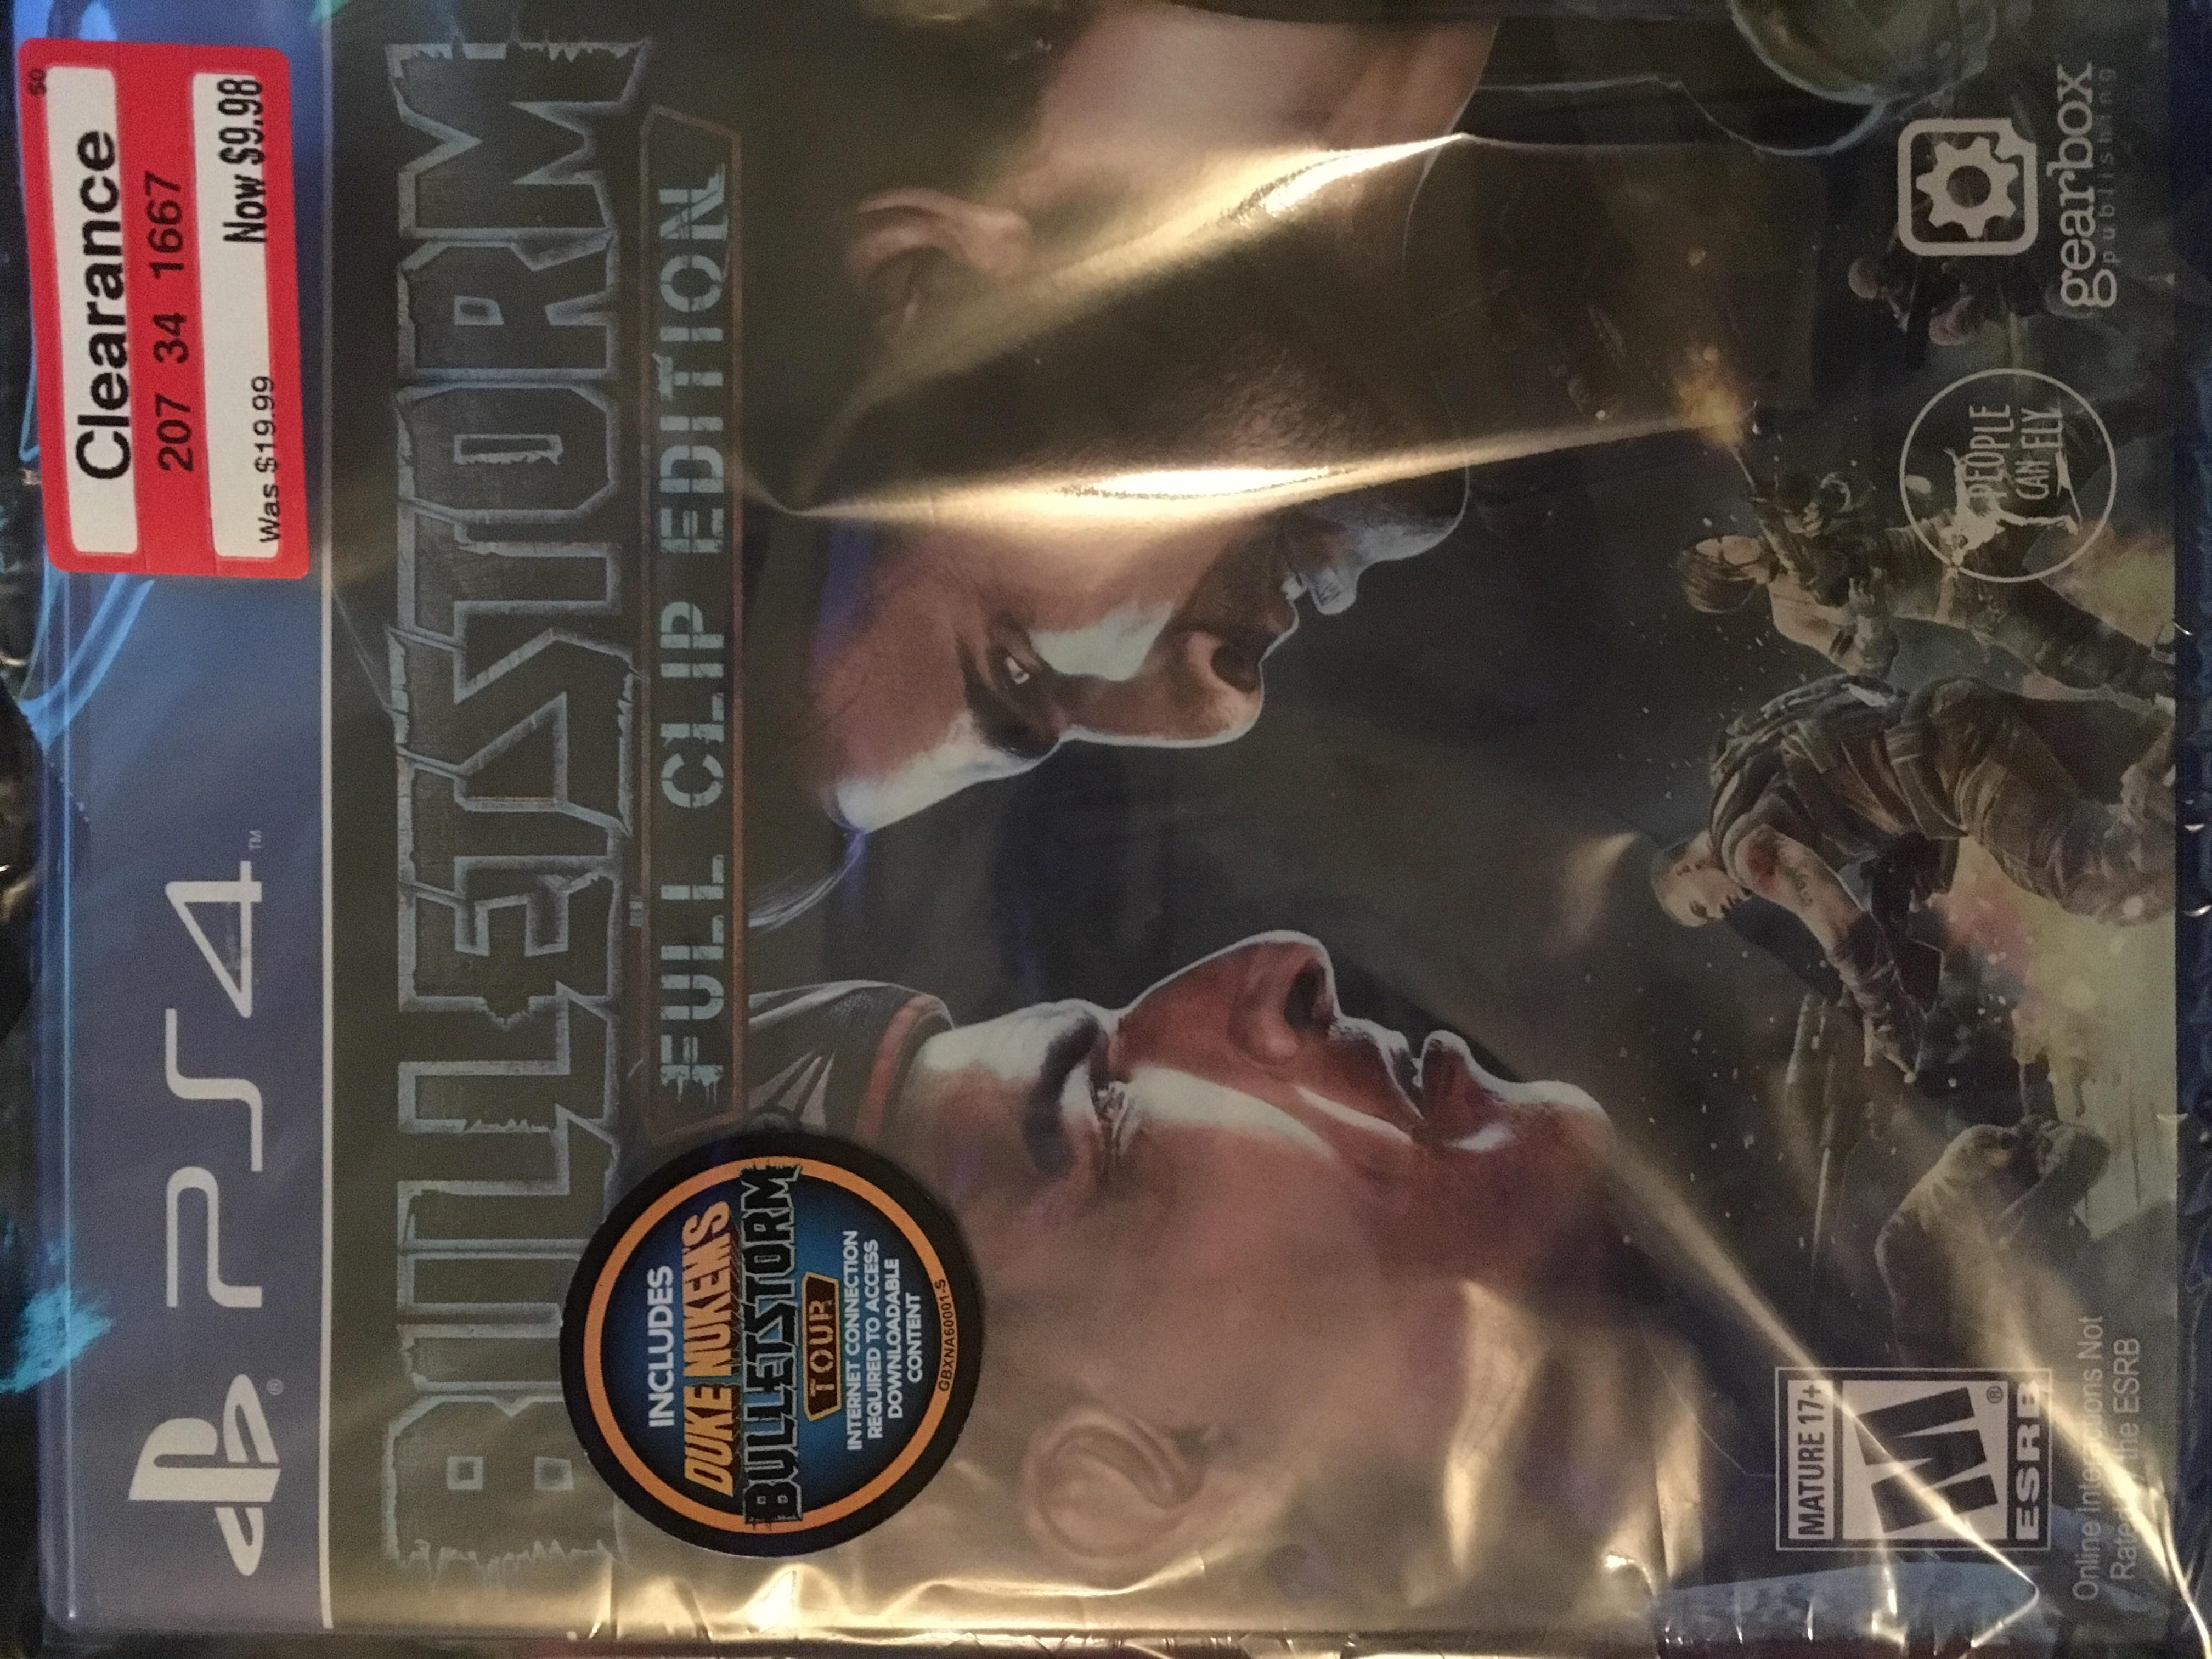 Bulletstorm PS4 clearance $9.98 Target YMMV